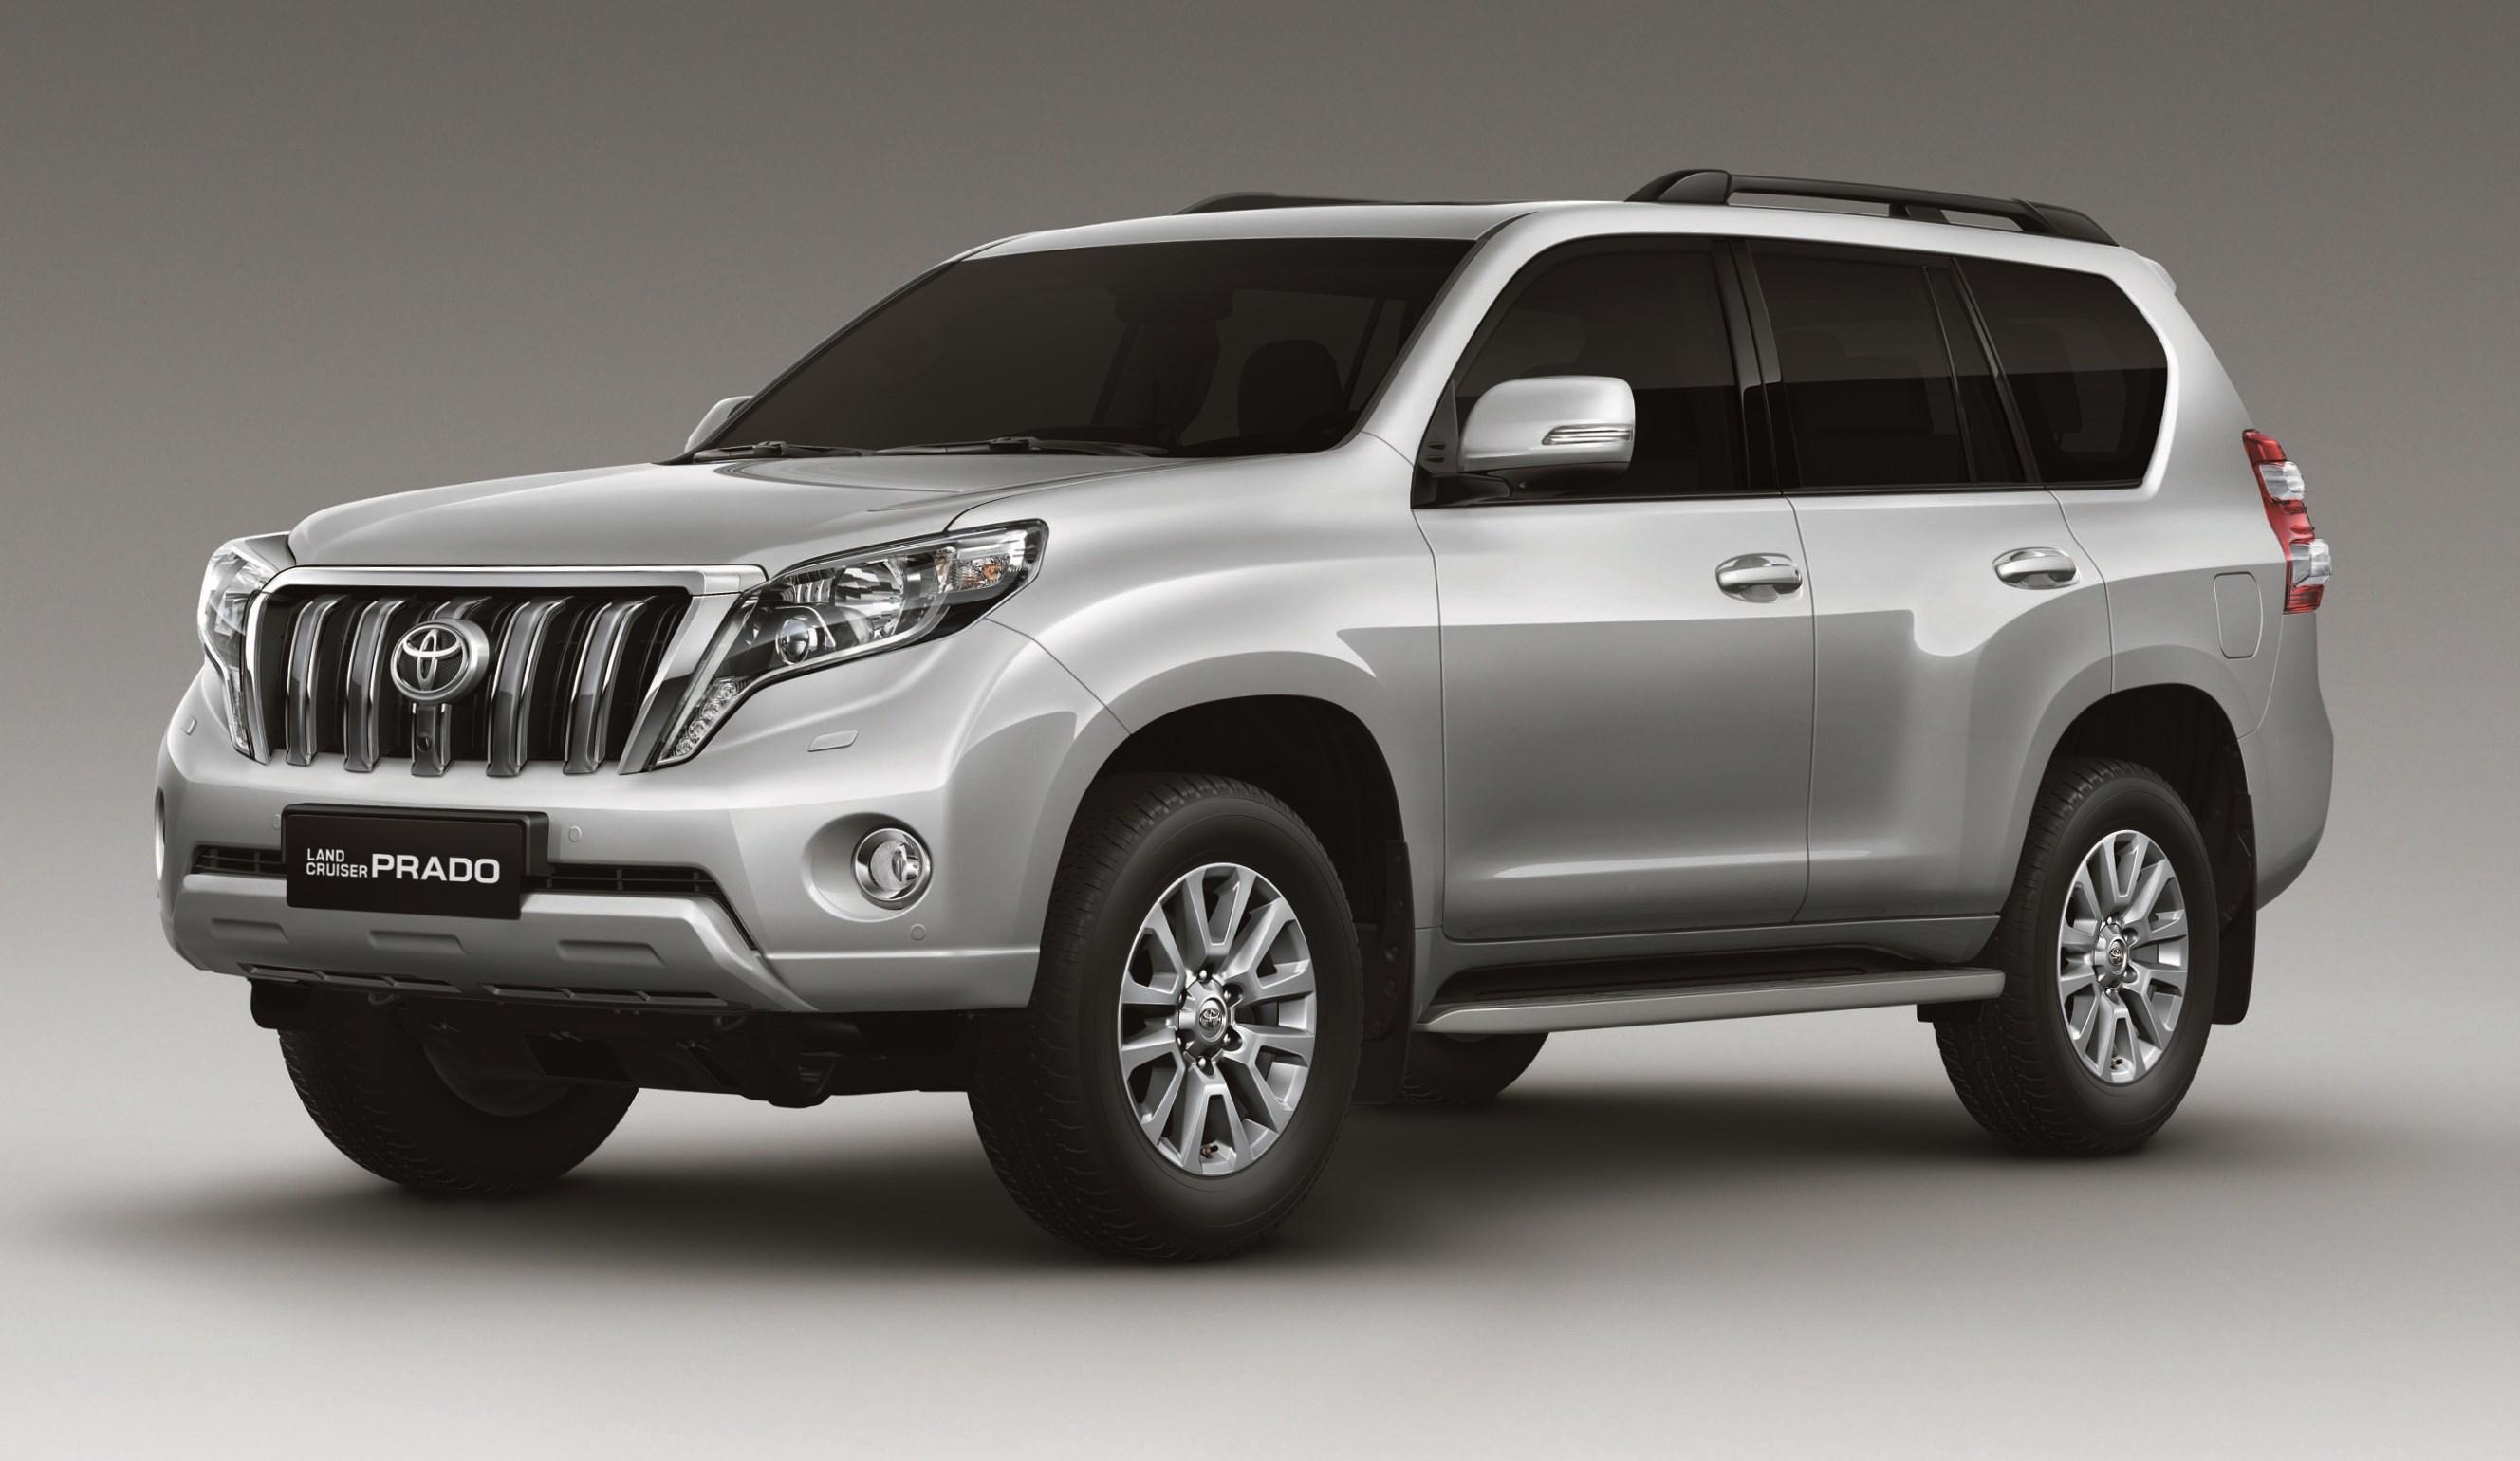 Toyota Prado 2013 Price List In South Africa   Autos Weblog